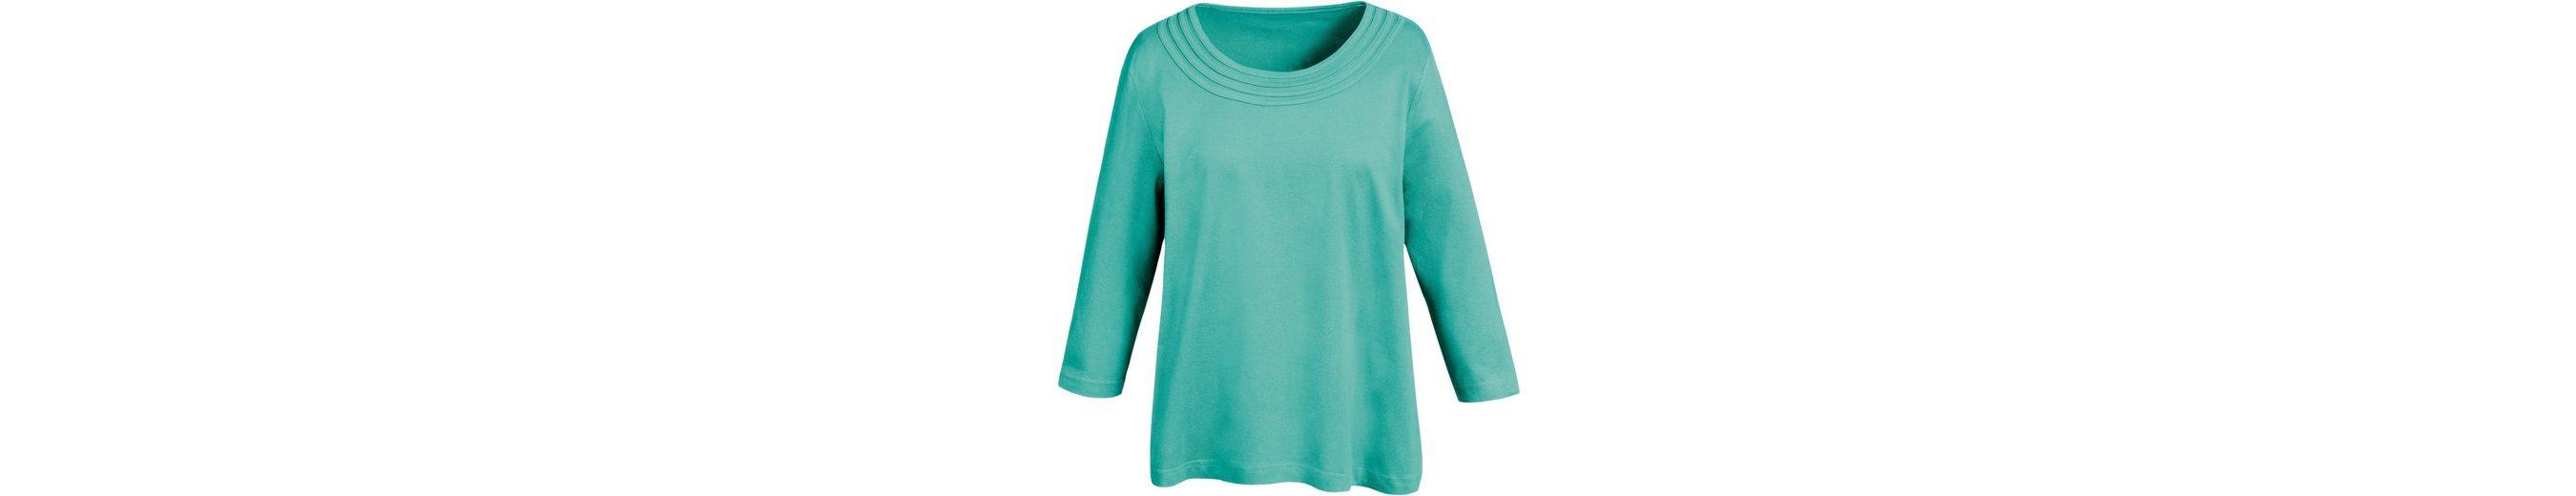 Fälschung Günstig Online Äußerst Classic Basics Shirt mit 3/4-Ärmel SsMd26cM9